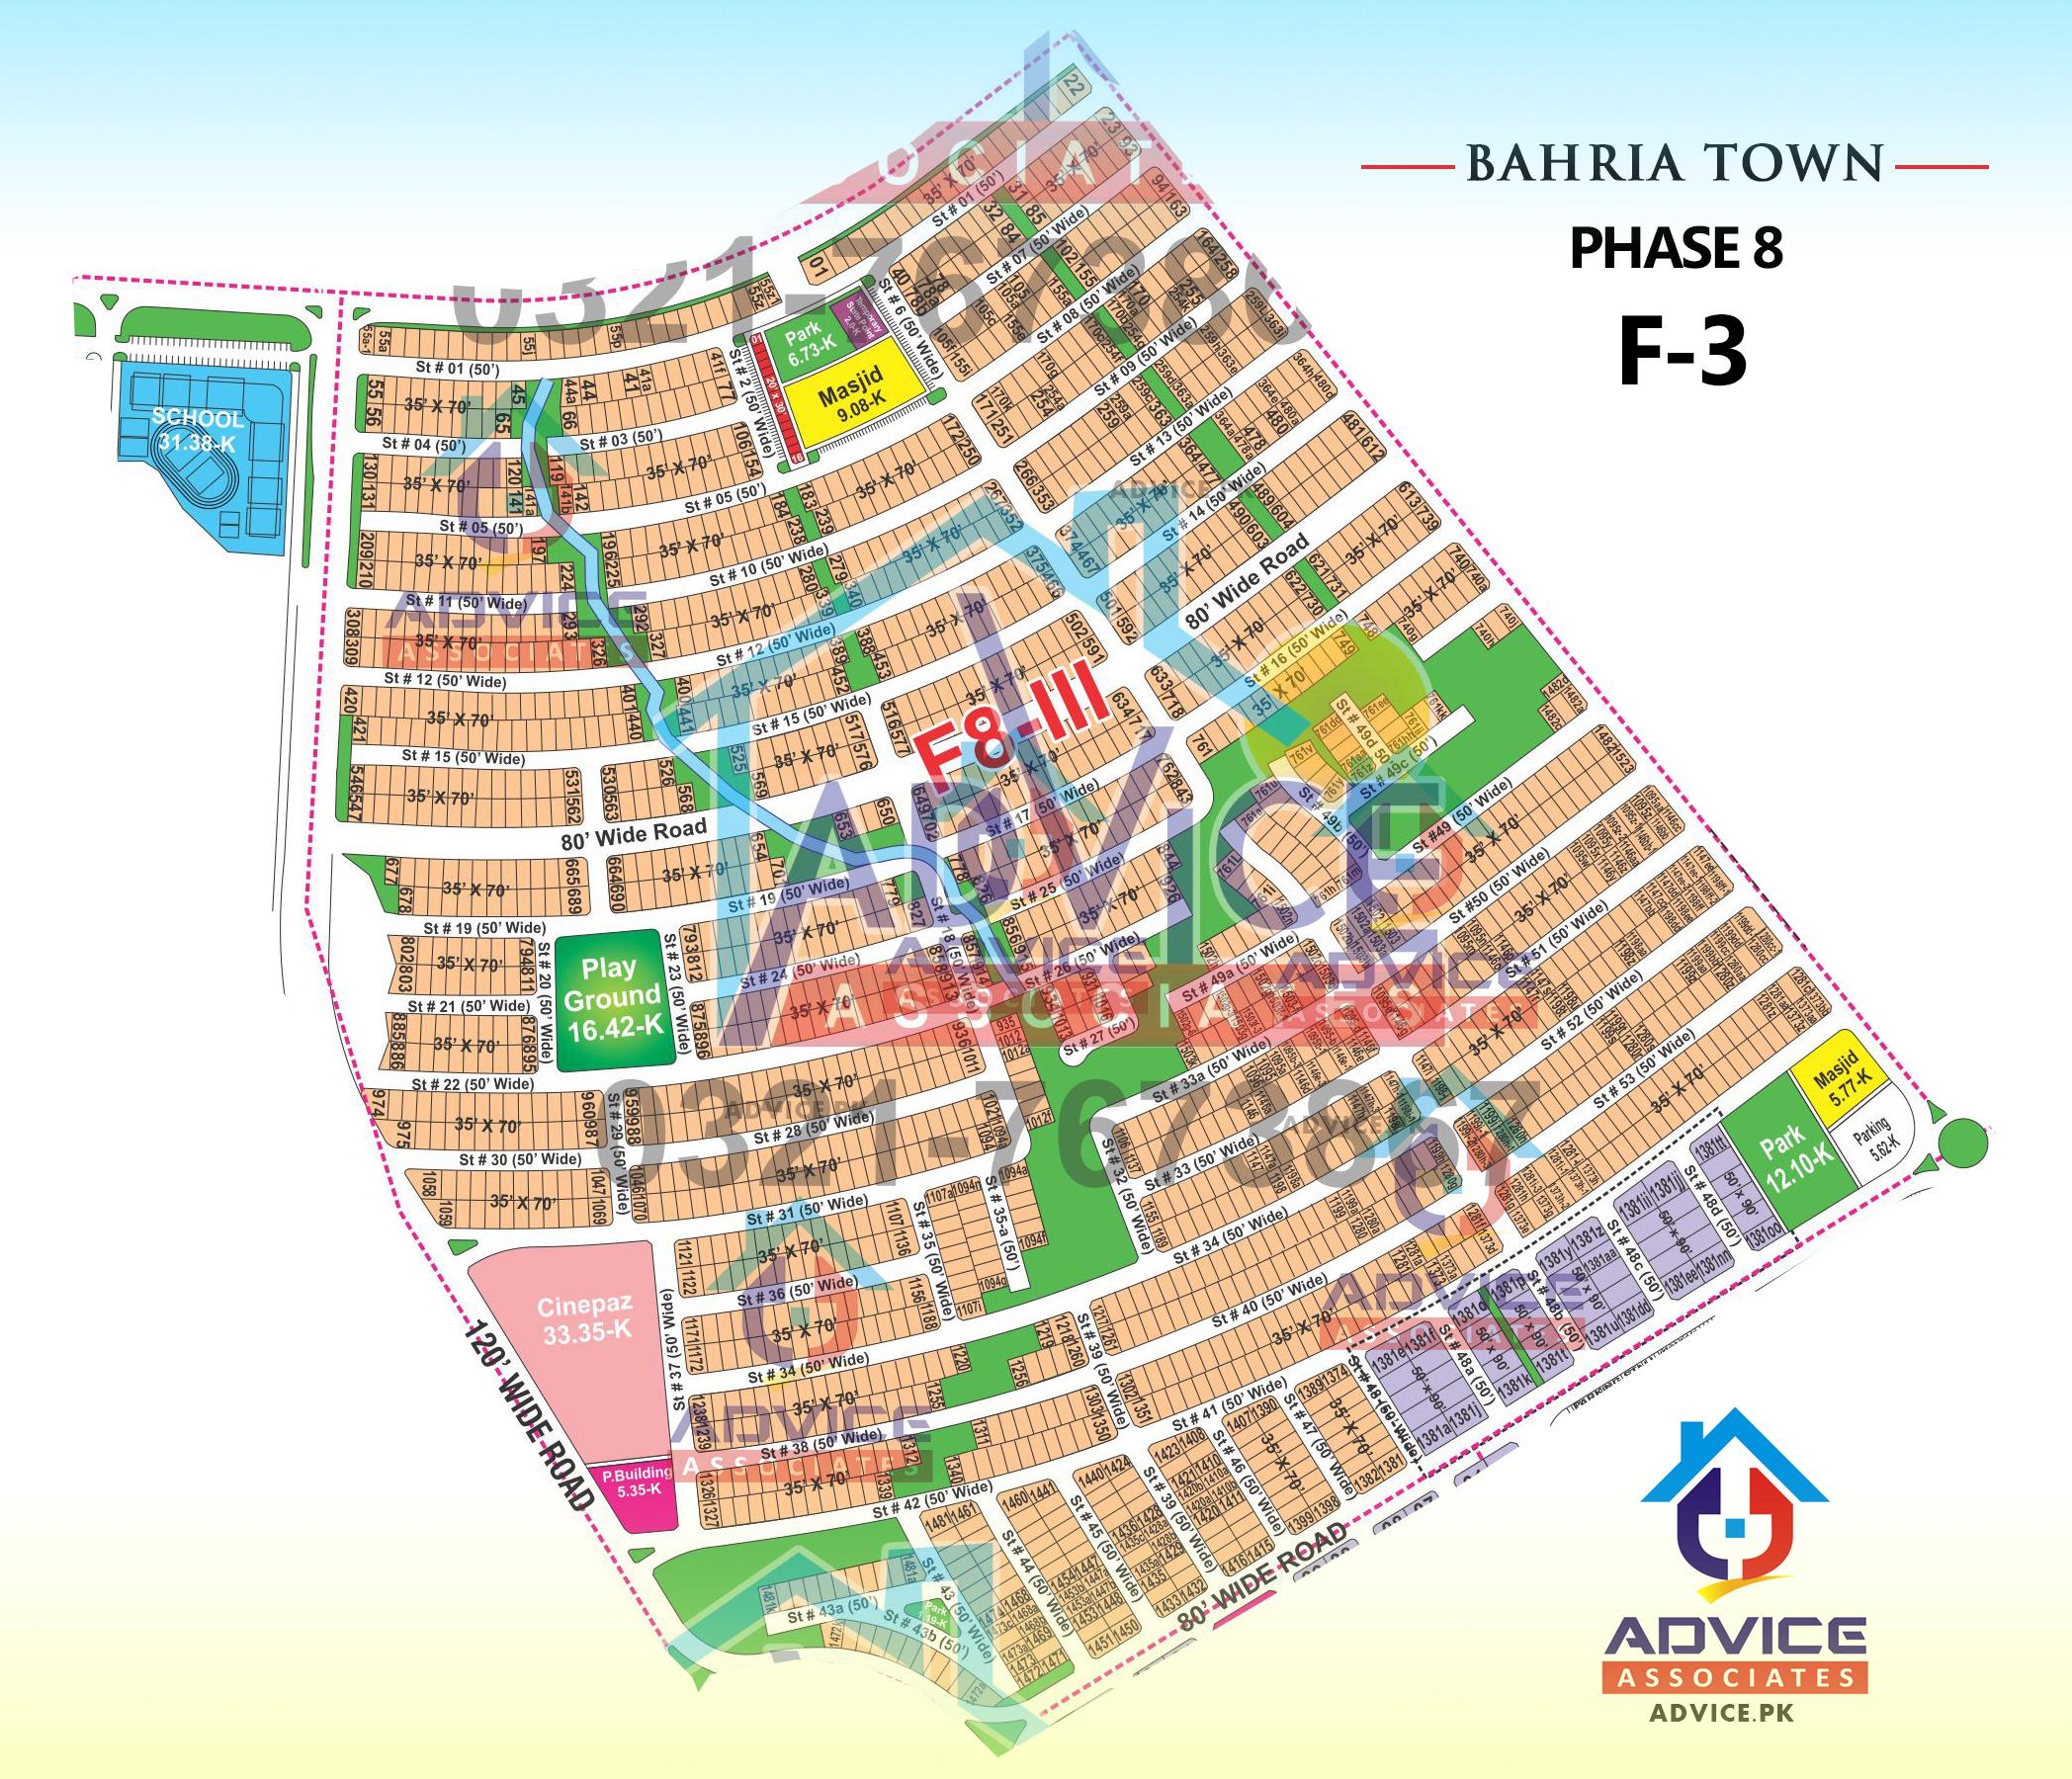 Bahria Town Phase 8 F3 Block